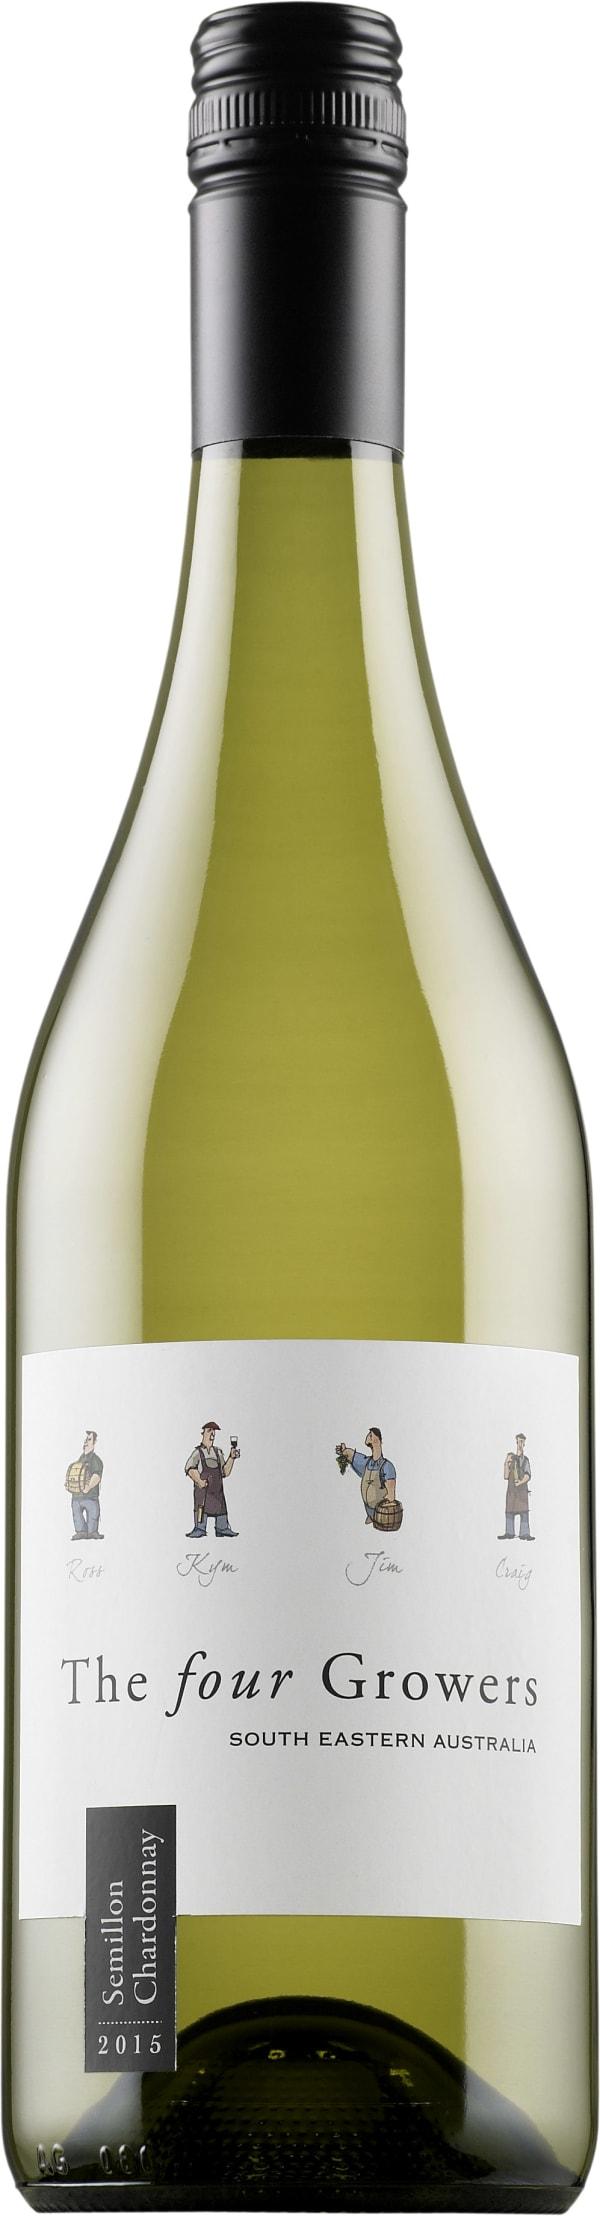 The Four Growers Semillon Chardonnay 2016